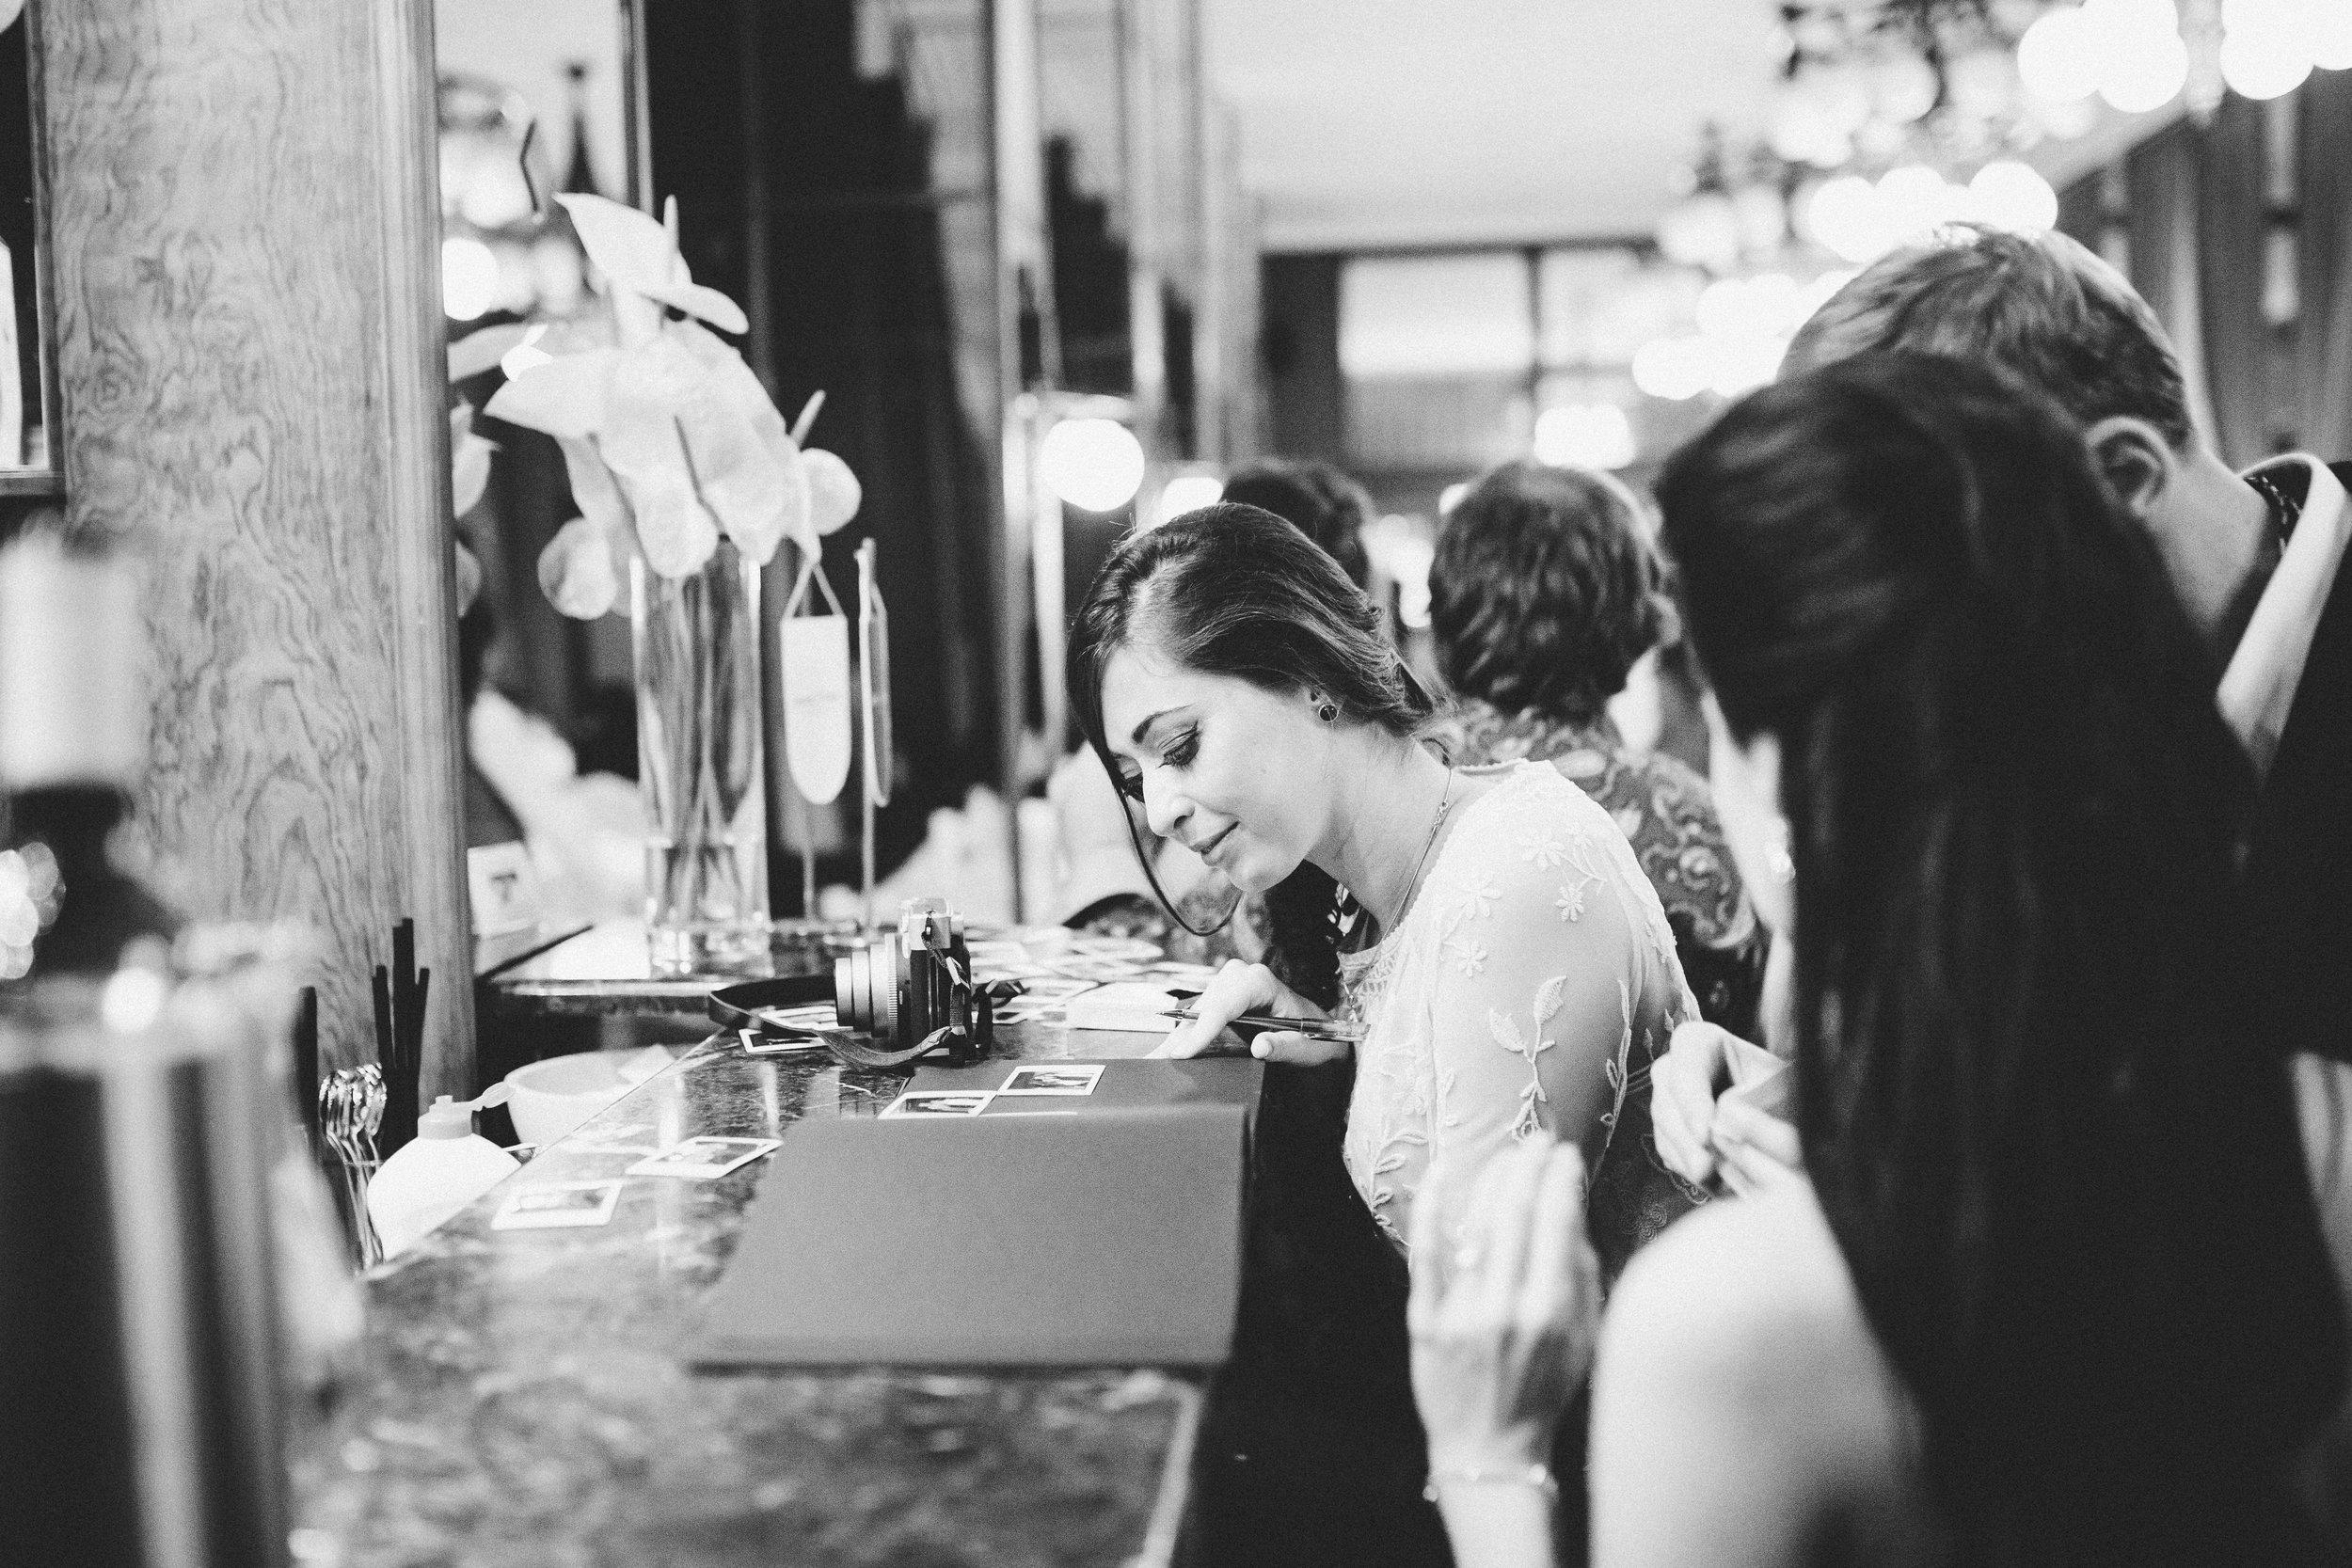 destination-wedding-photographer-slovakia-bratislava-bw-documentary-style-moment.jpg